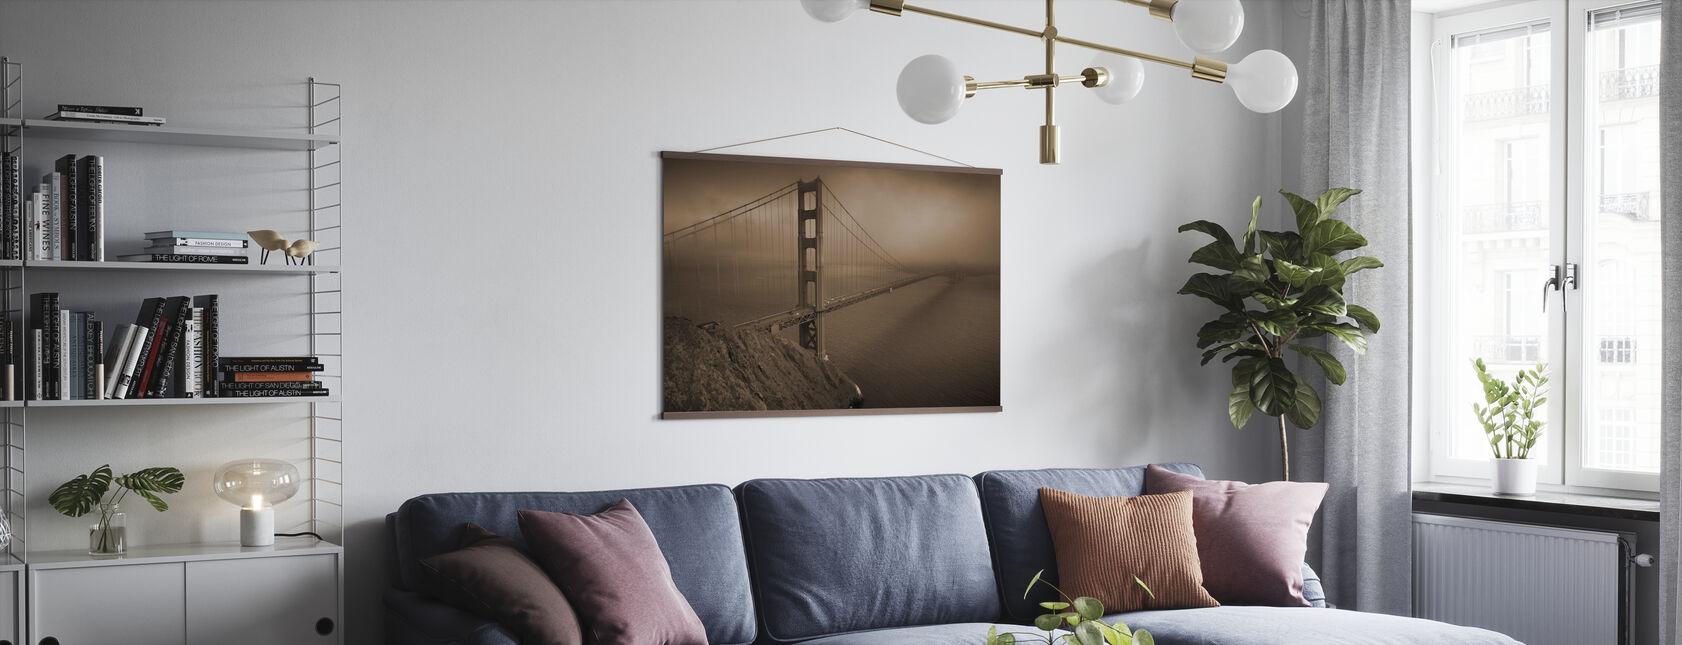 Golden Gate - Sépia - Affiche - Salle à manger